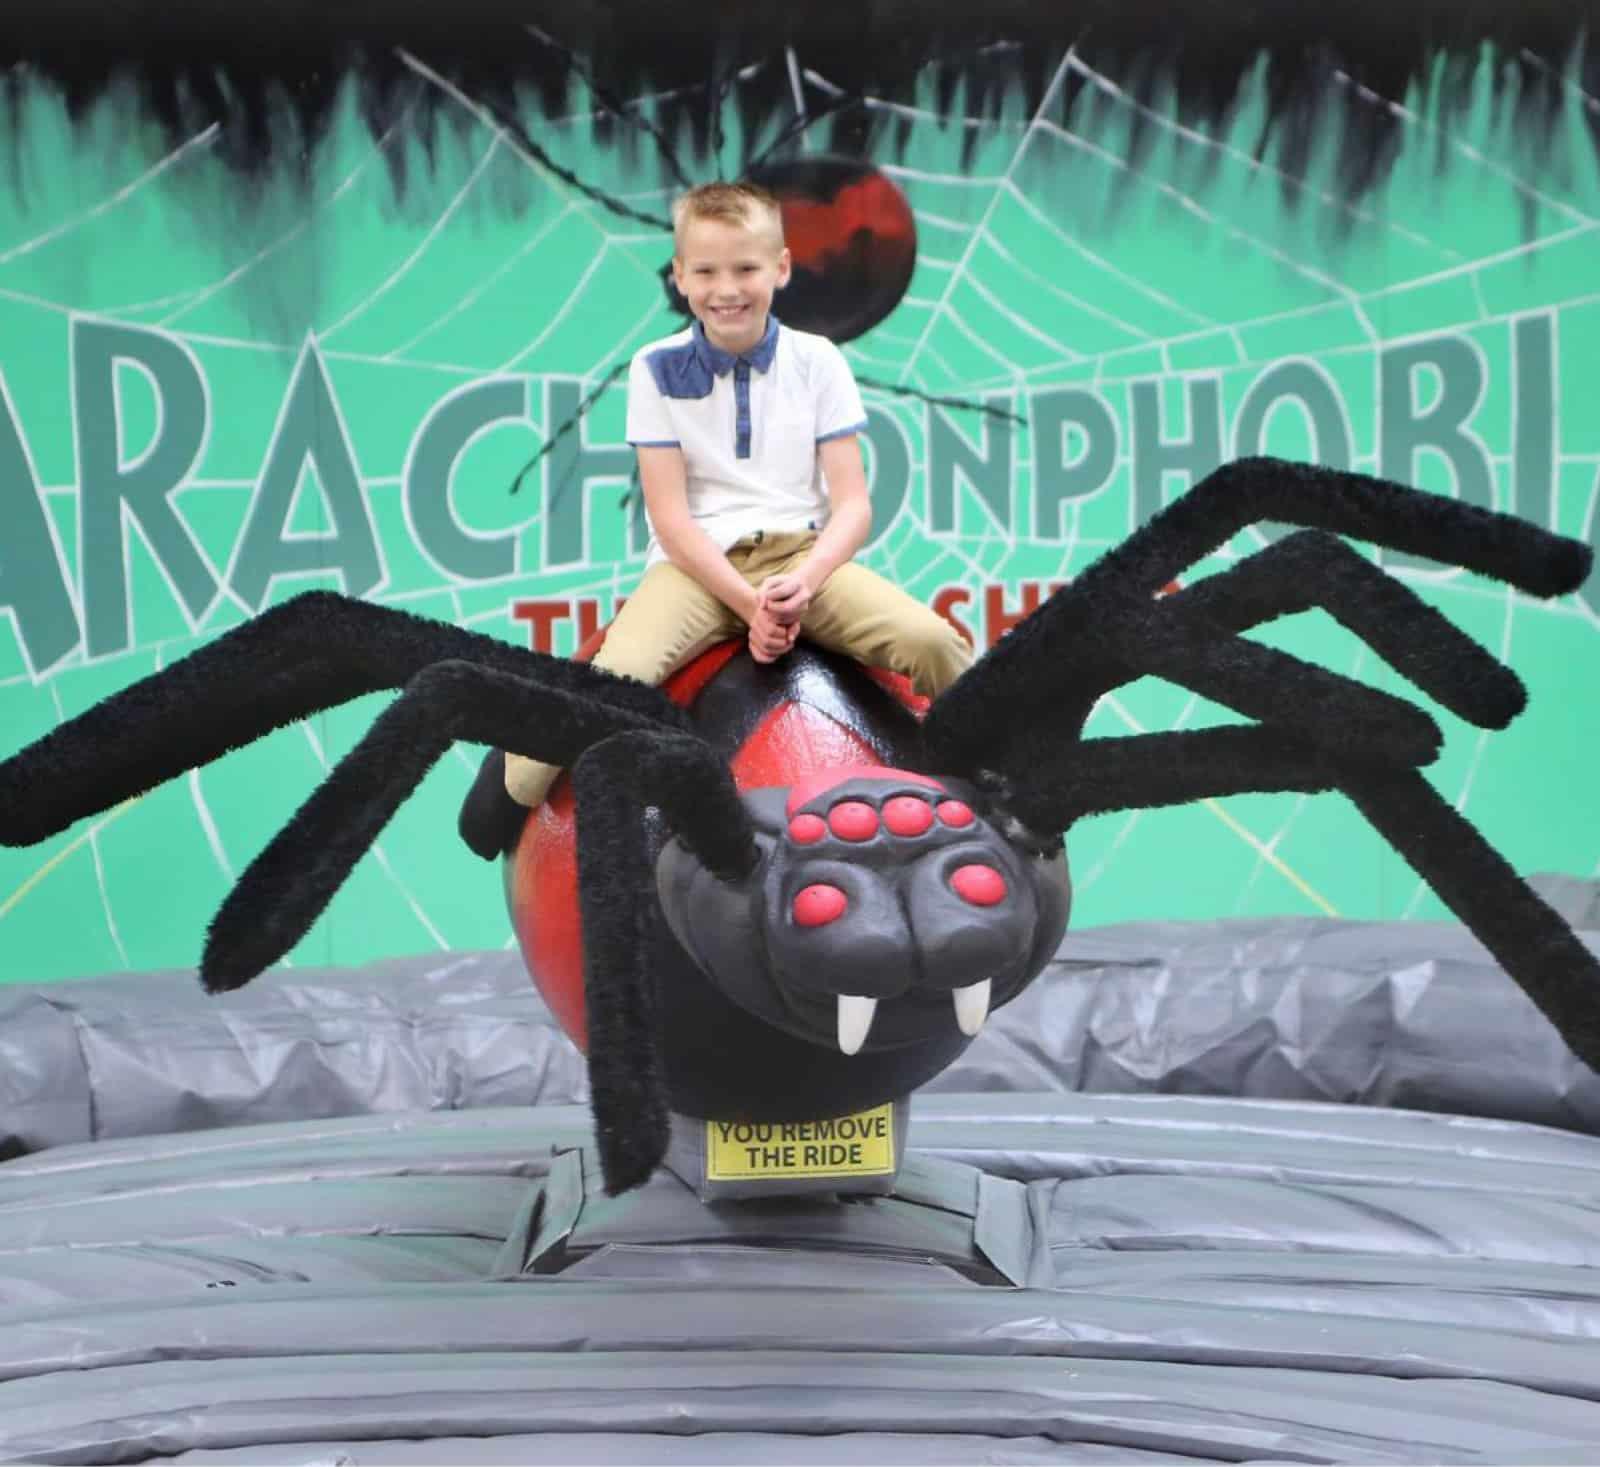 Scary Halloween Rides